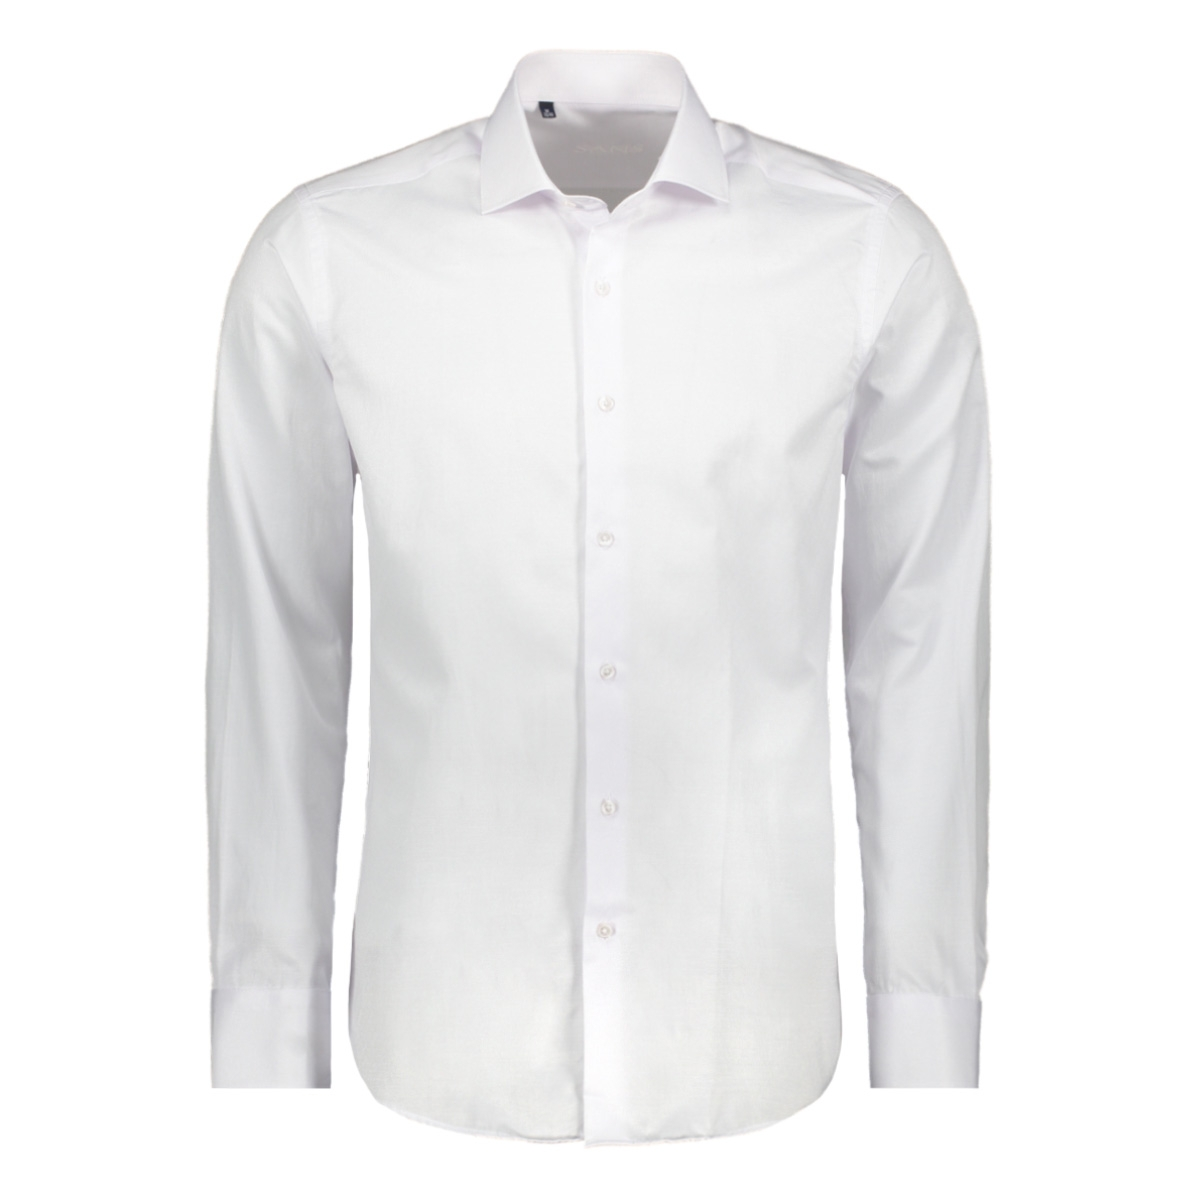 shirt 5024 sans overhemd 09